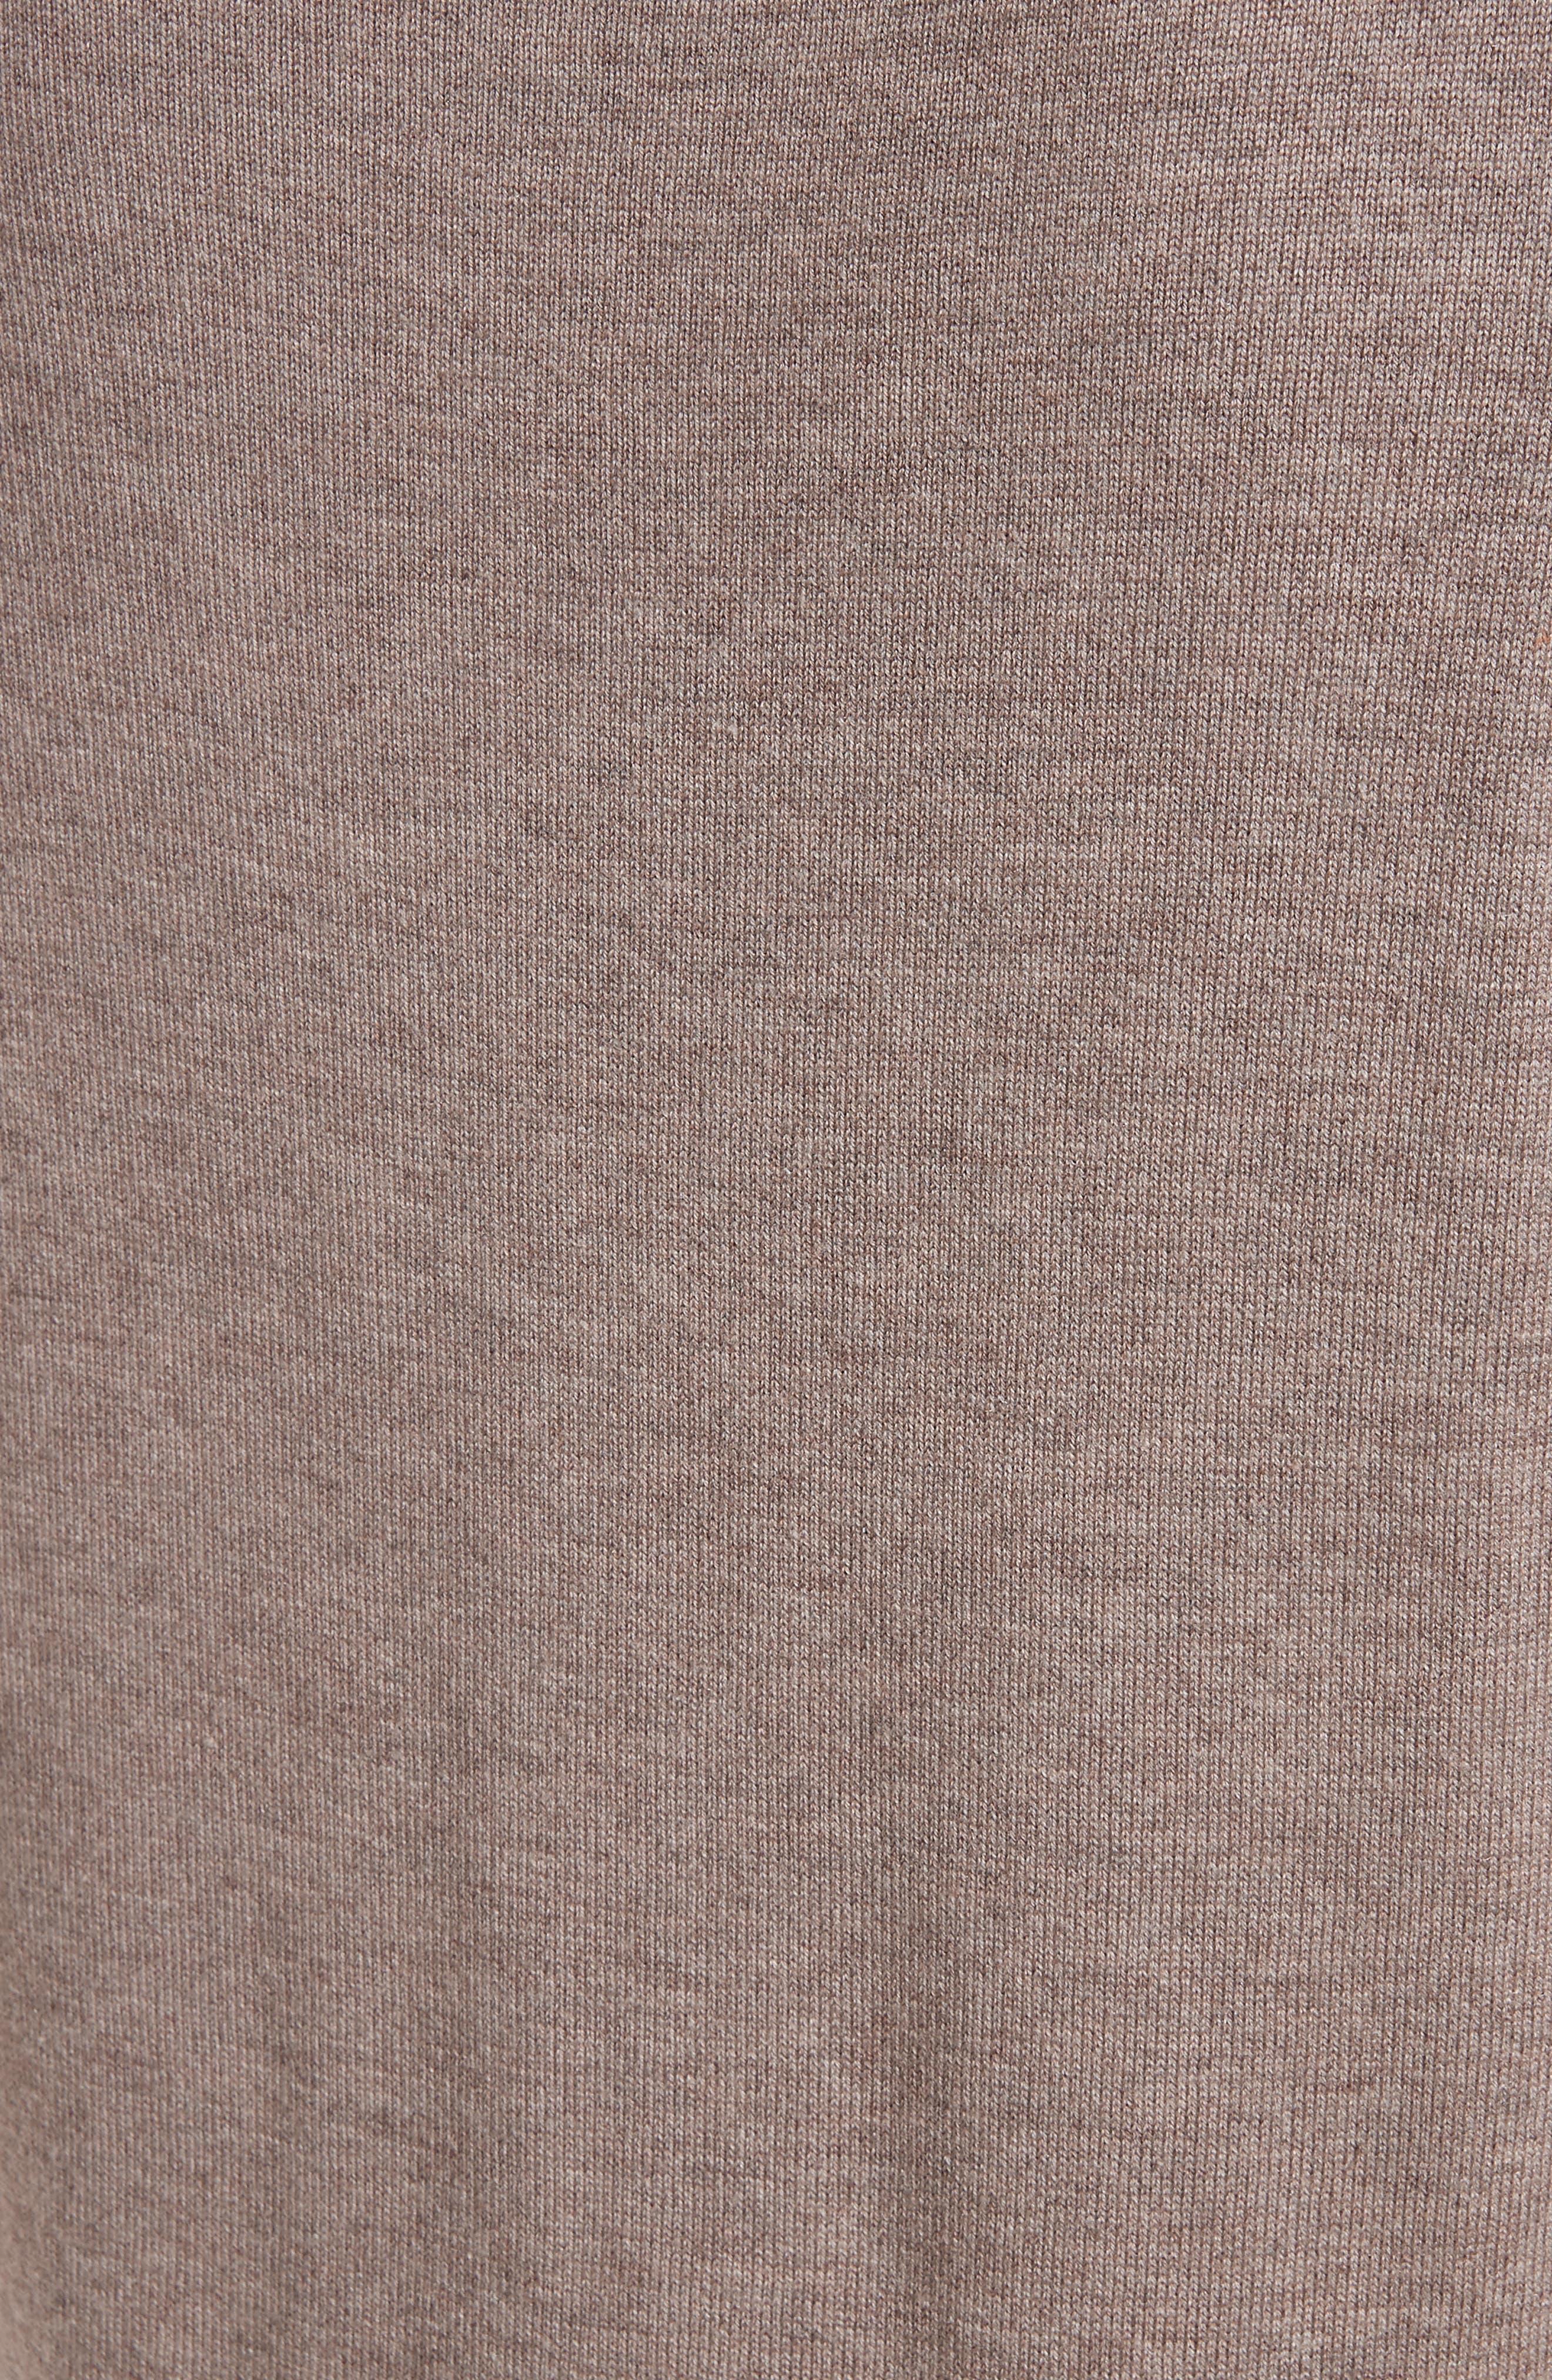 Catriona Wool & Silk Sweater Dress,                             Alternate thumbnail 12, color,